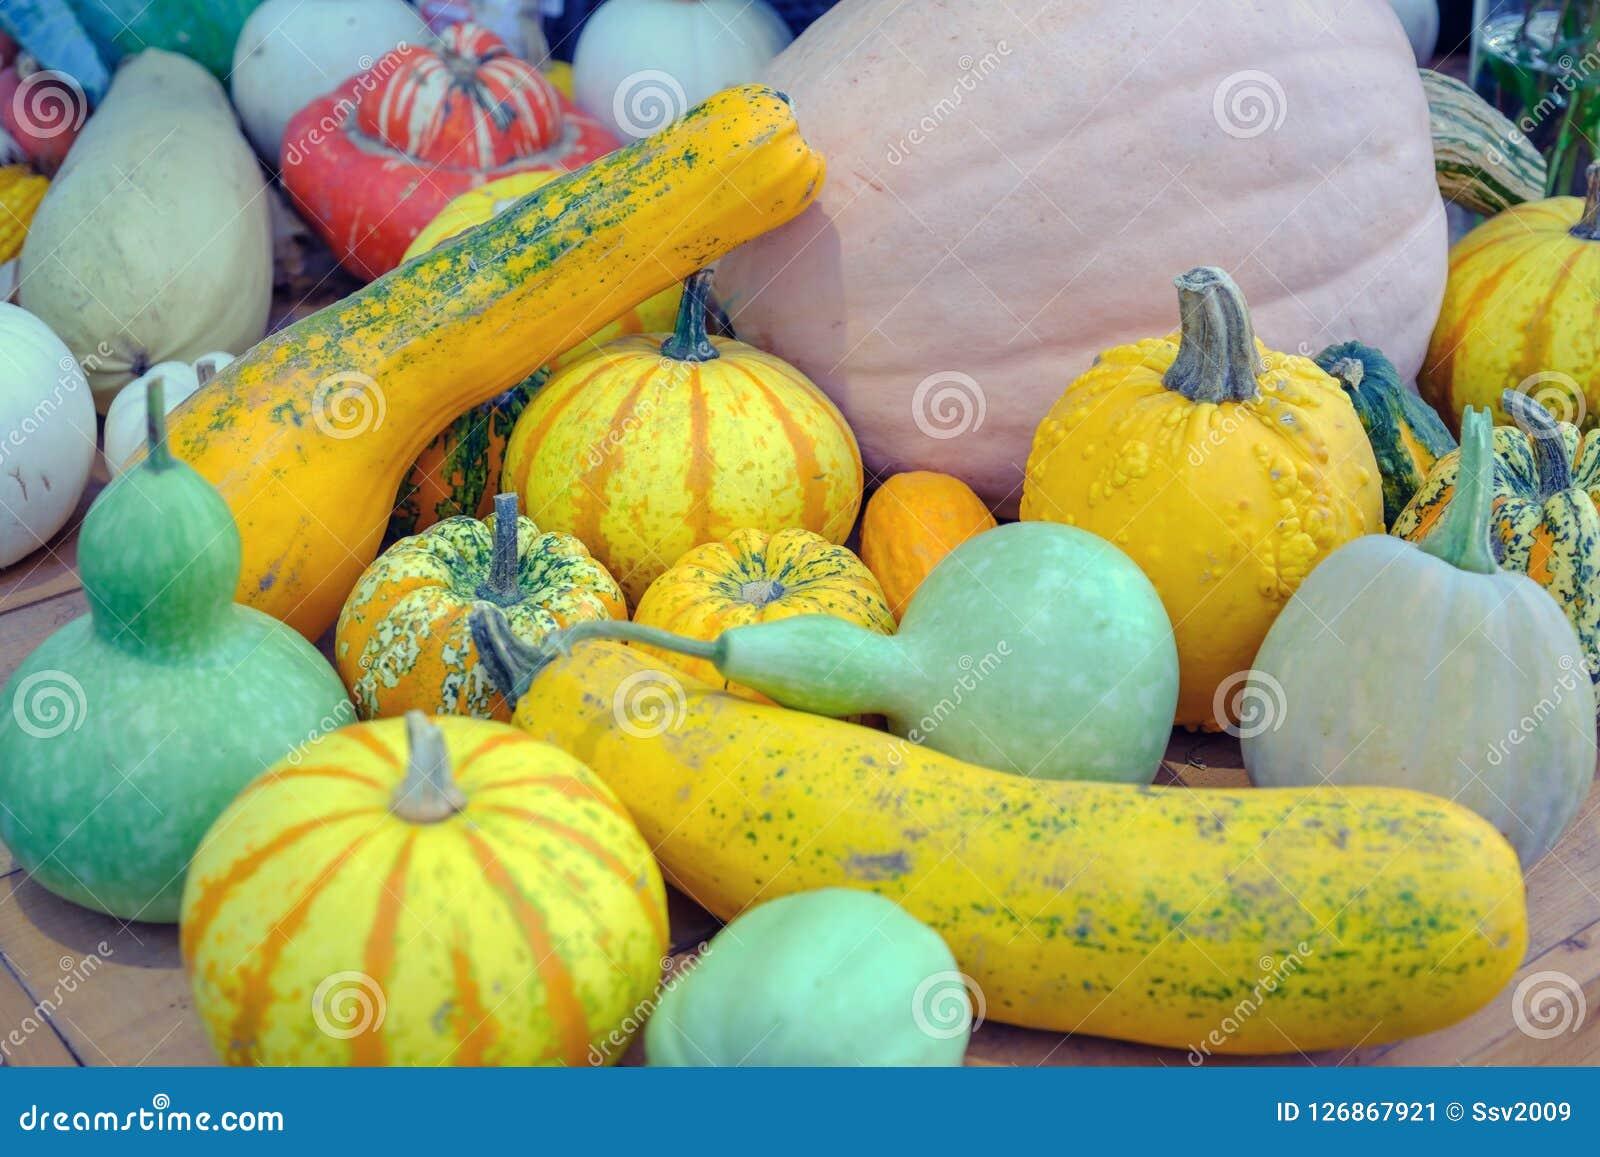 Decorative colorful pumpkins.